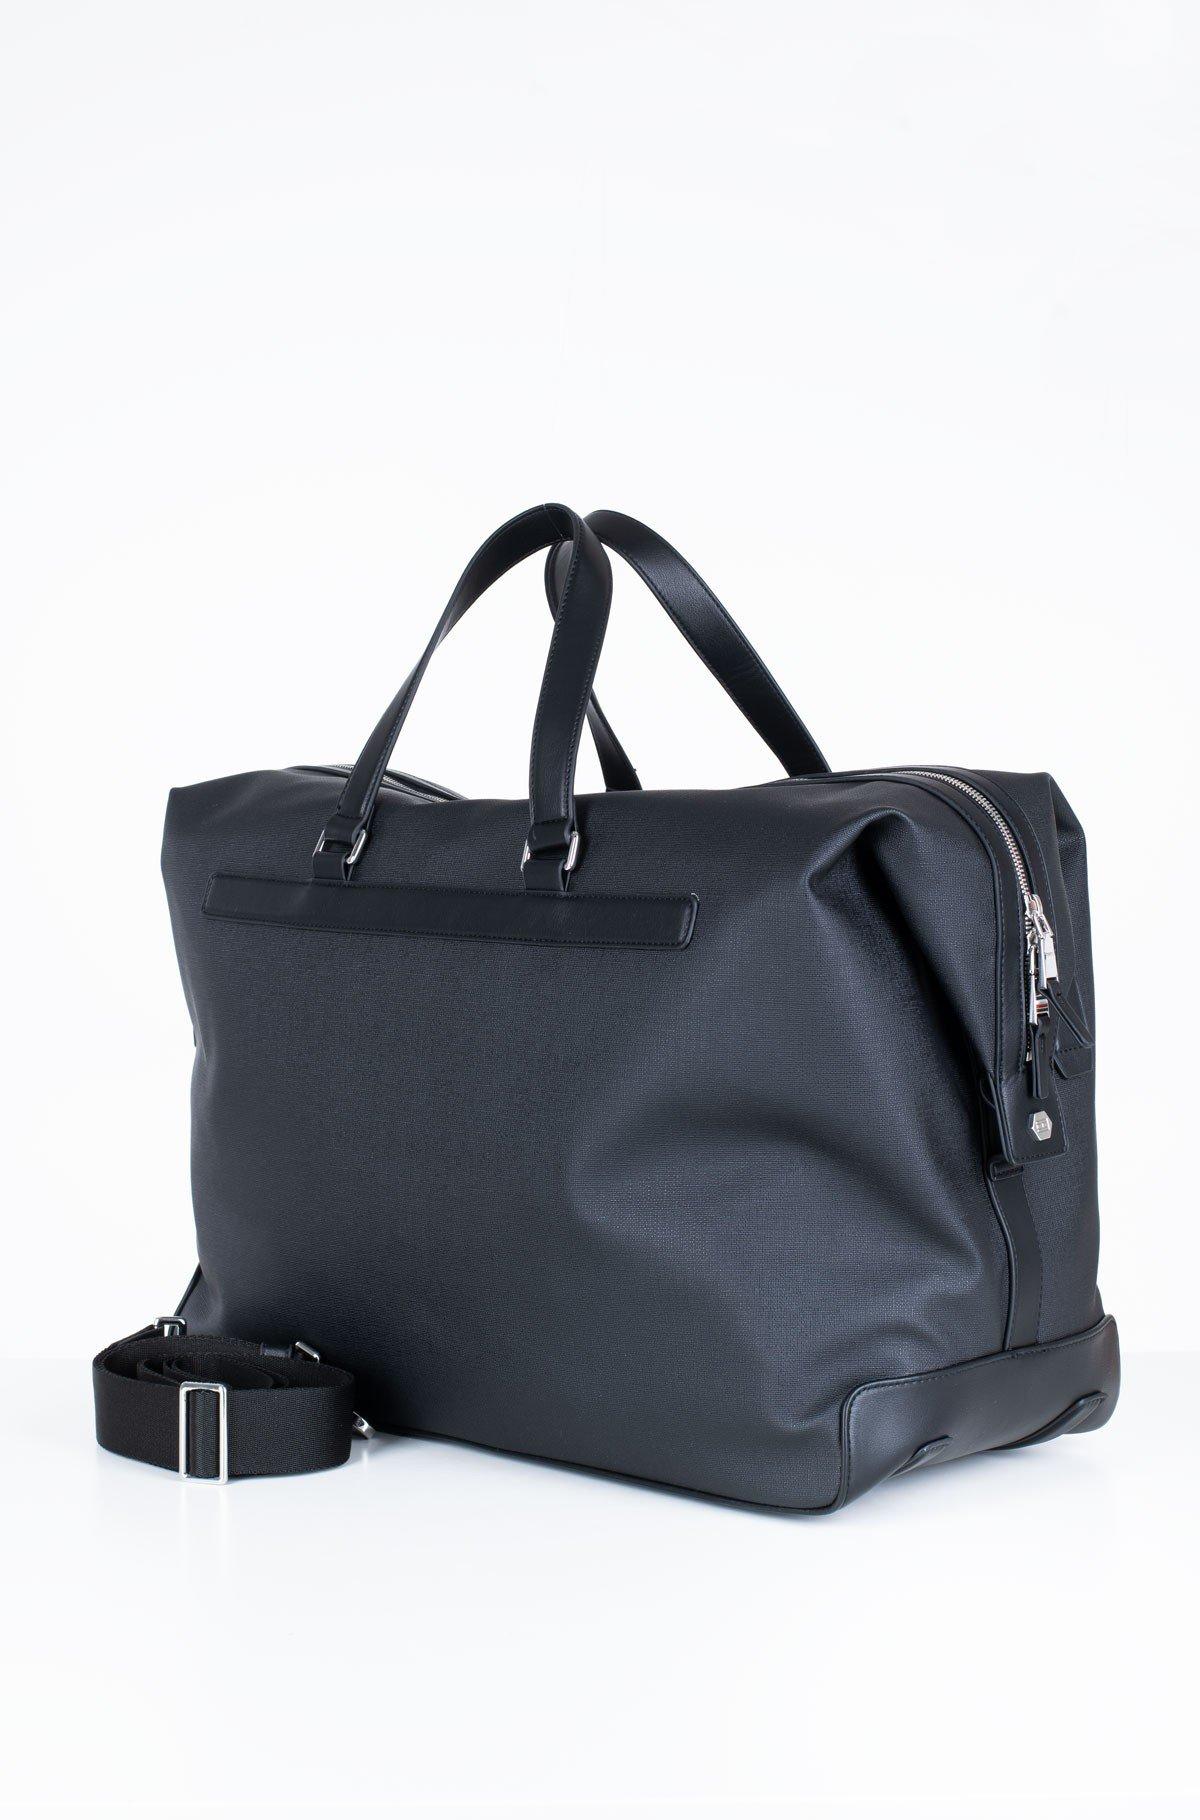 Kelionių krepšys COATED CANVAS DUFFLE-full-2